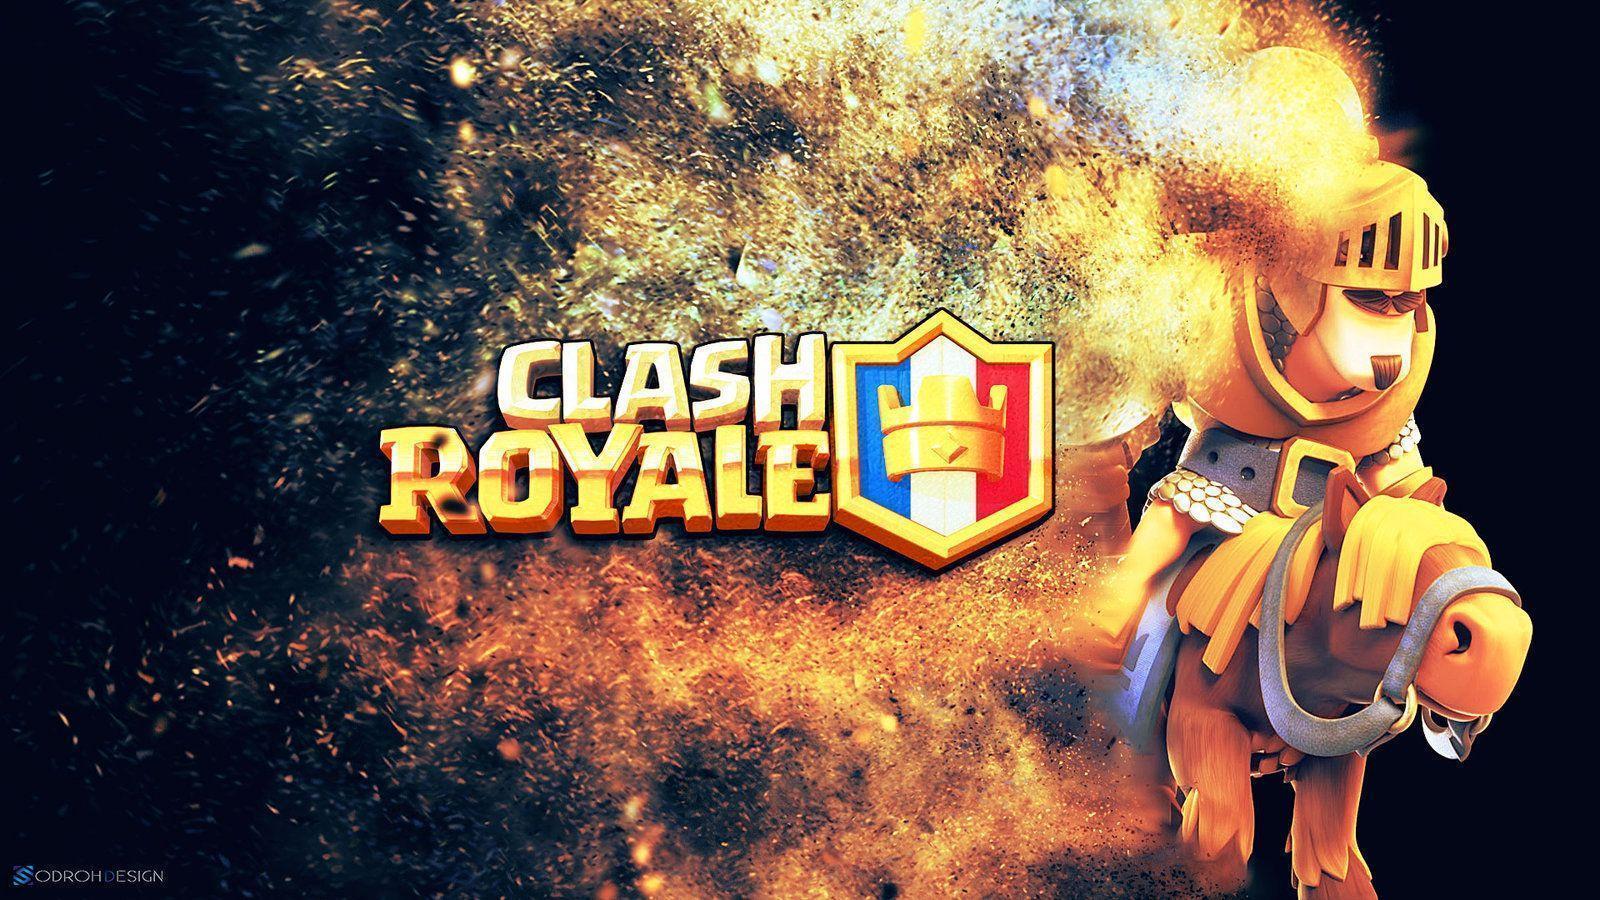 Clash Royale Wallapaper 2 by Sodroh on DeviantArt